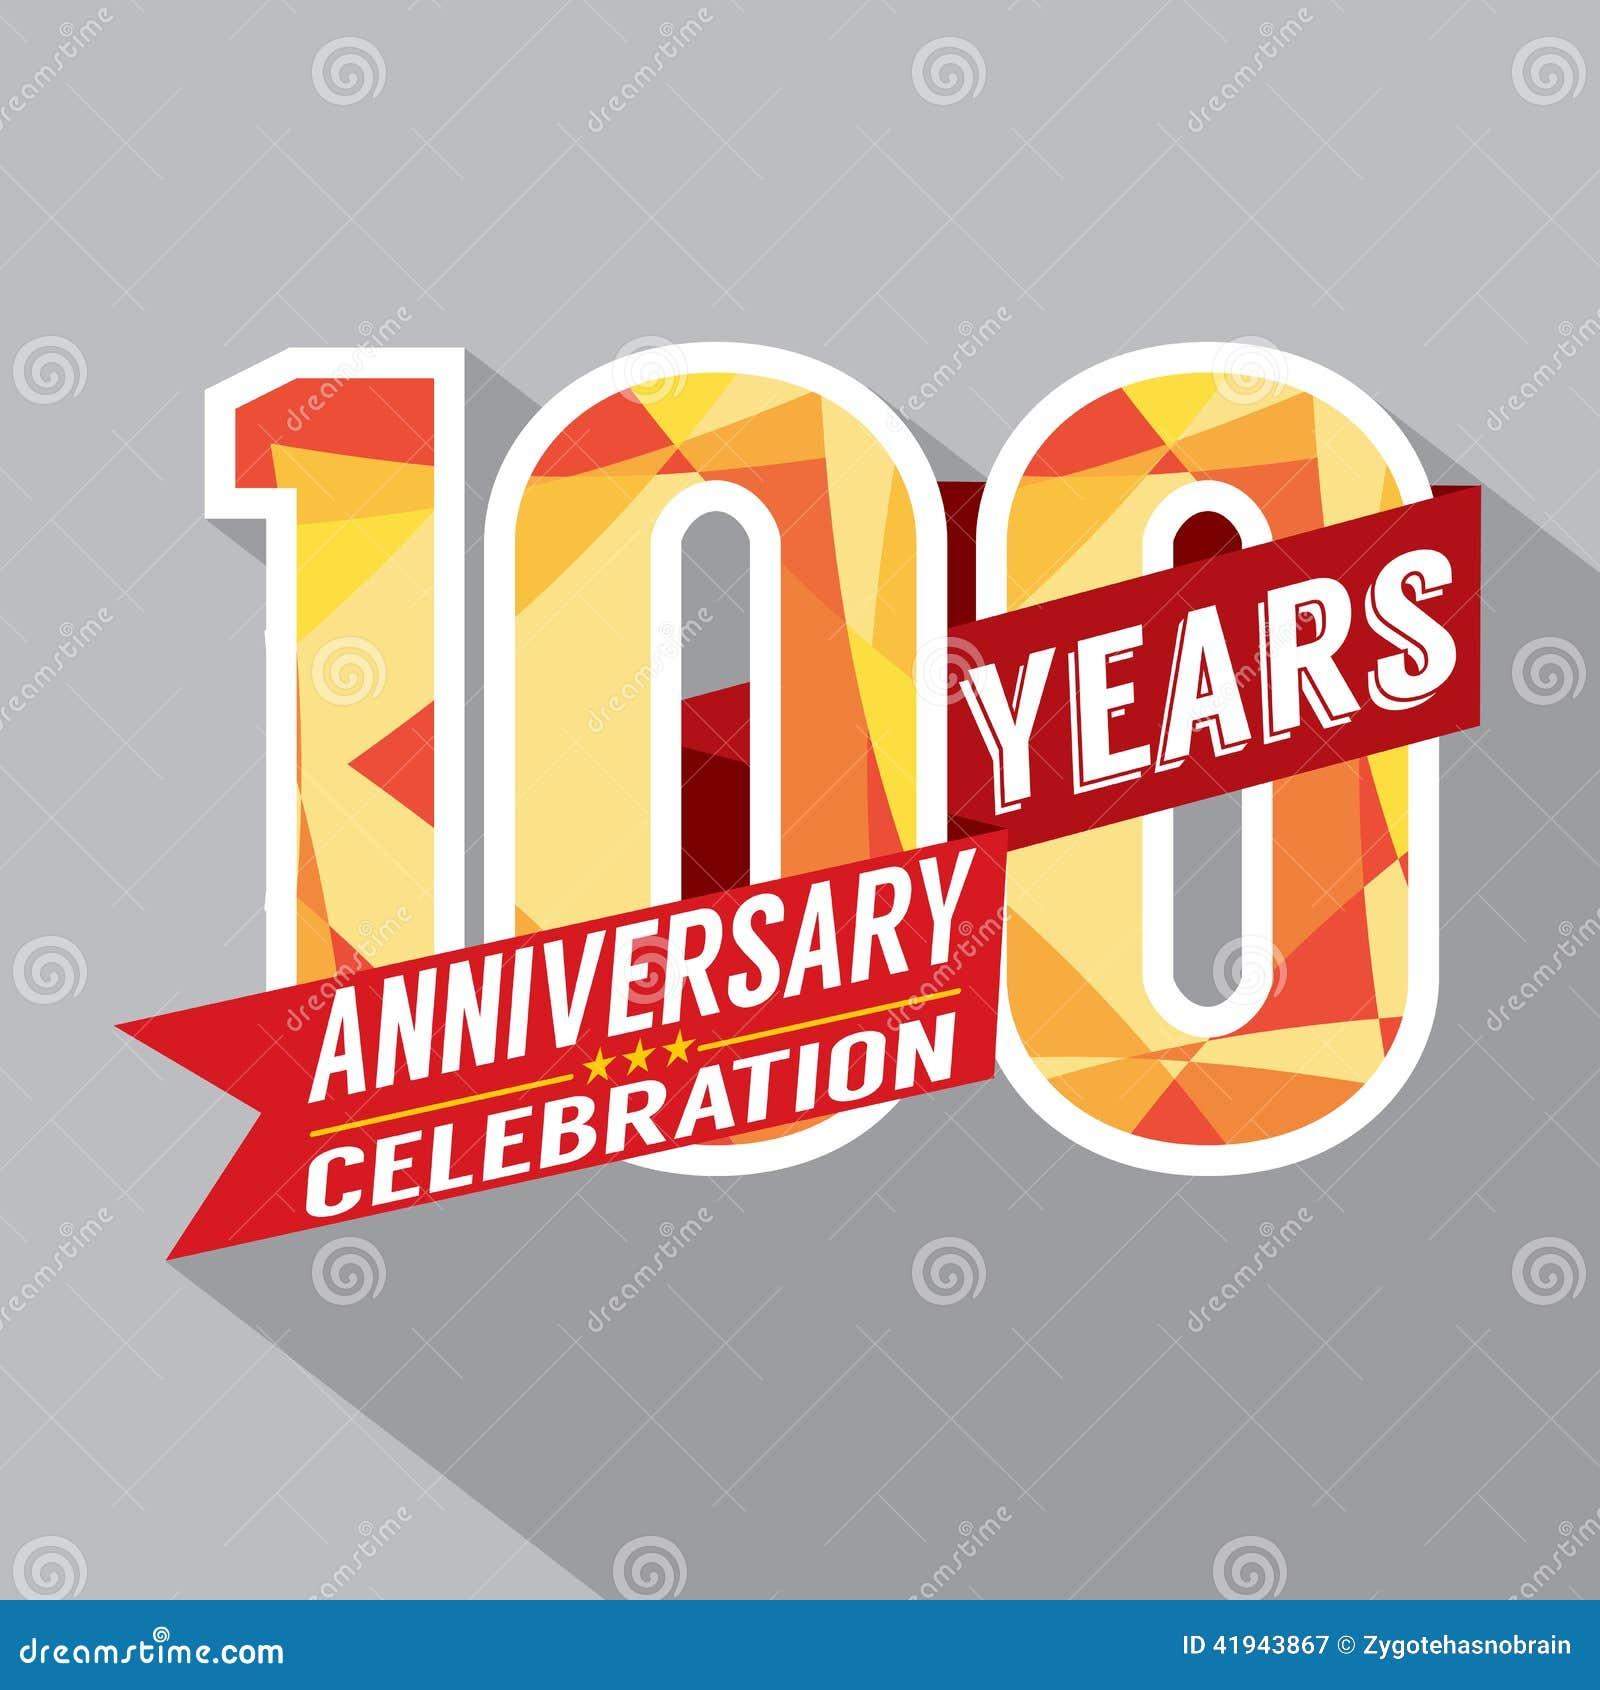 100th Years Anniversary Celebration Design Stock Vector Image